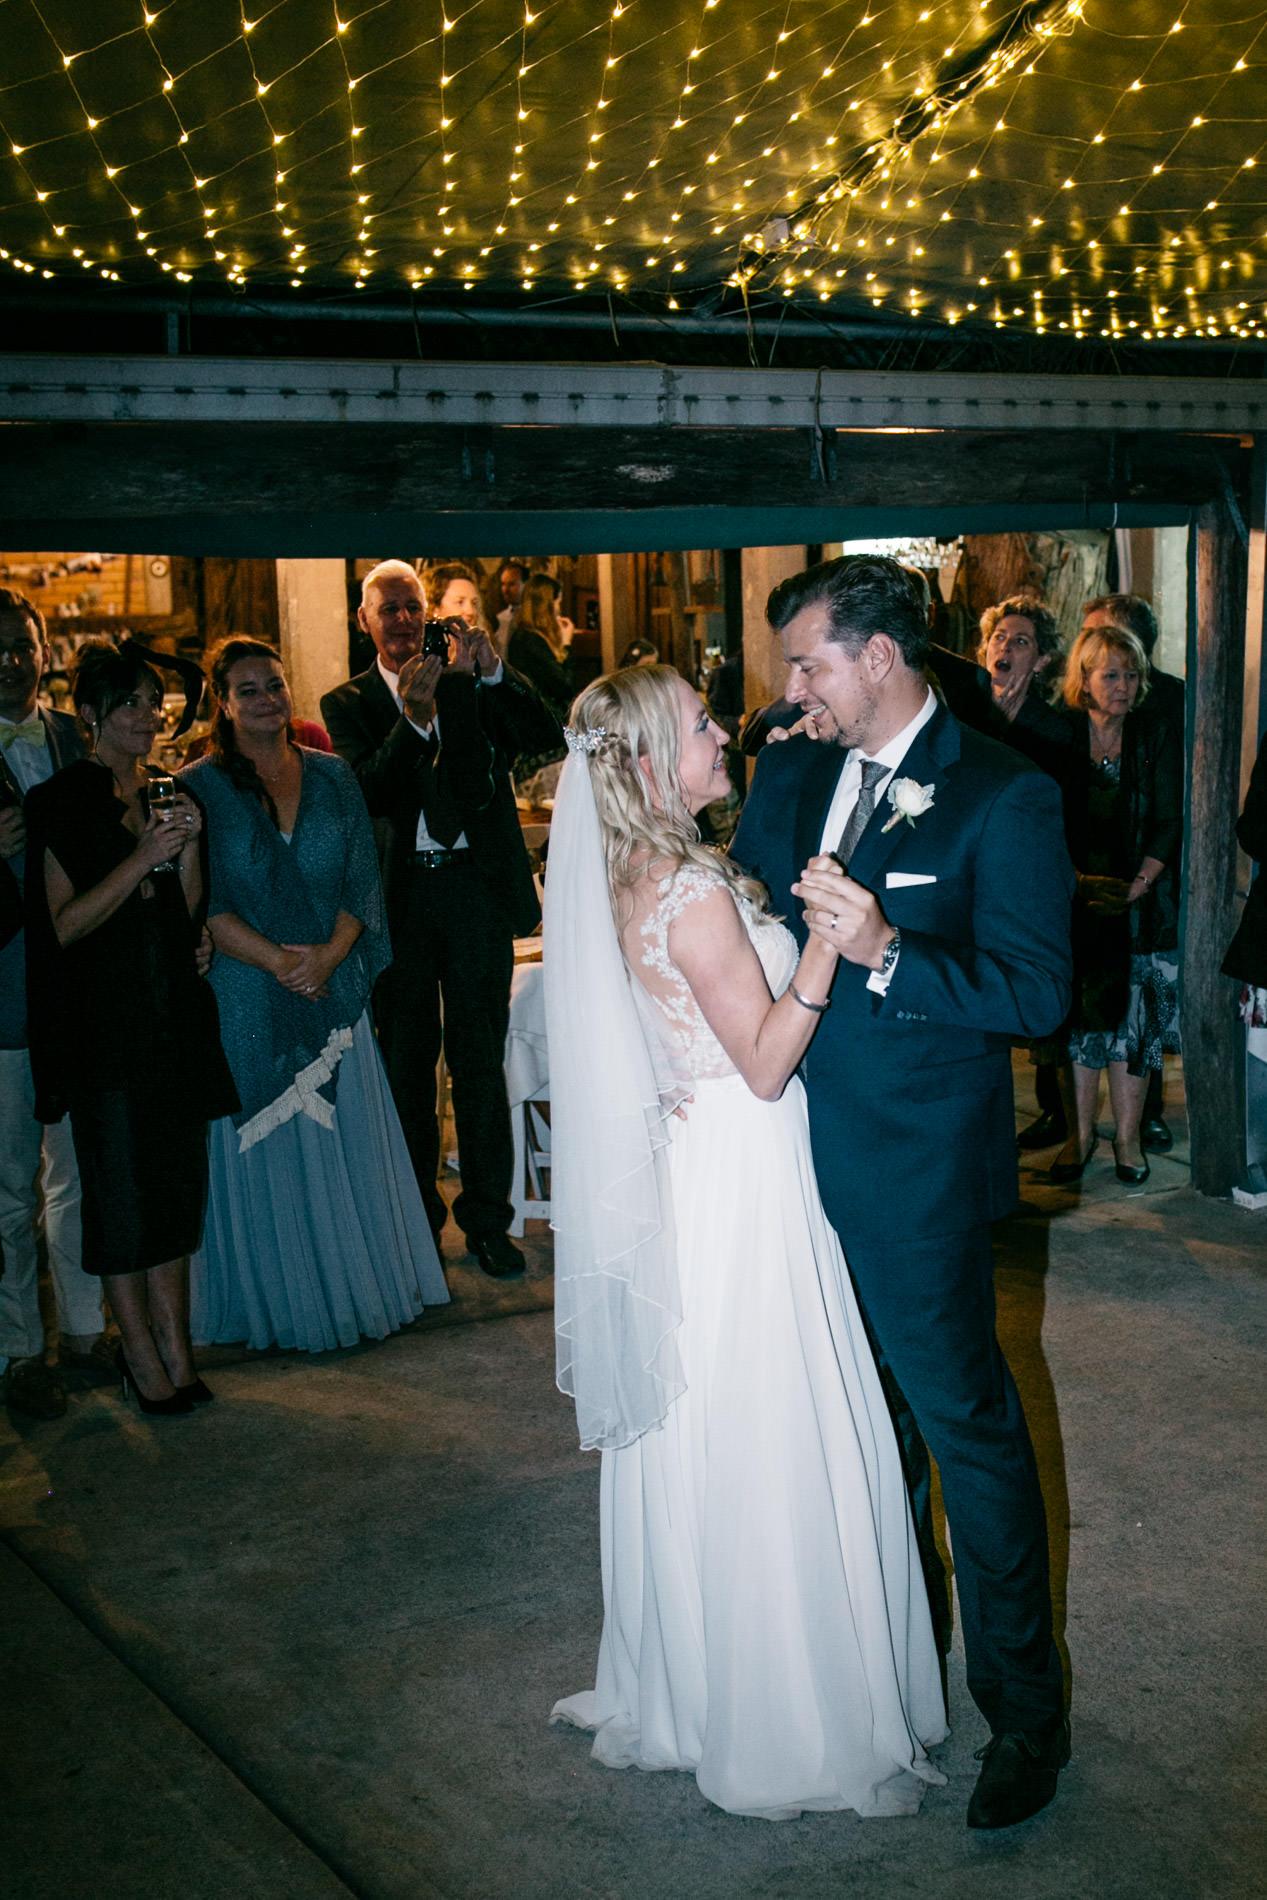 True North Photography_Boomerang Farm_Stacey and Isaac_Gold Coast Wedding_Barm Wedding_Hinterland Wedding-212.jpg